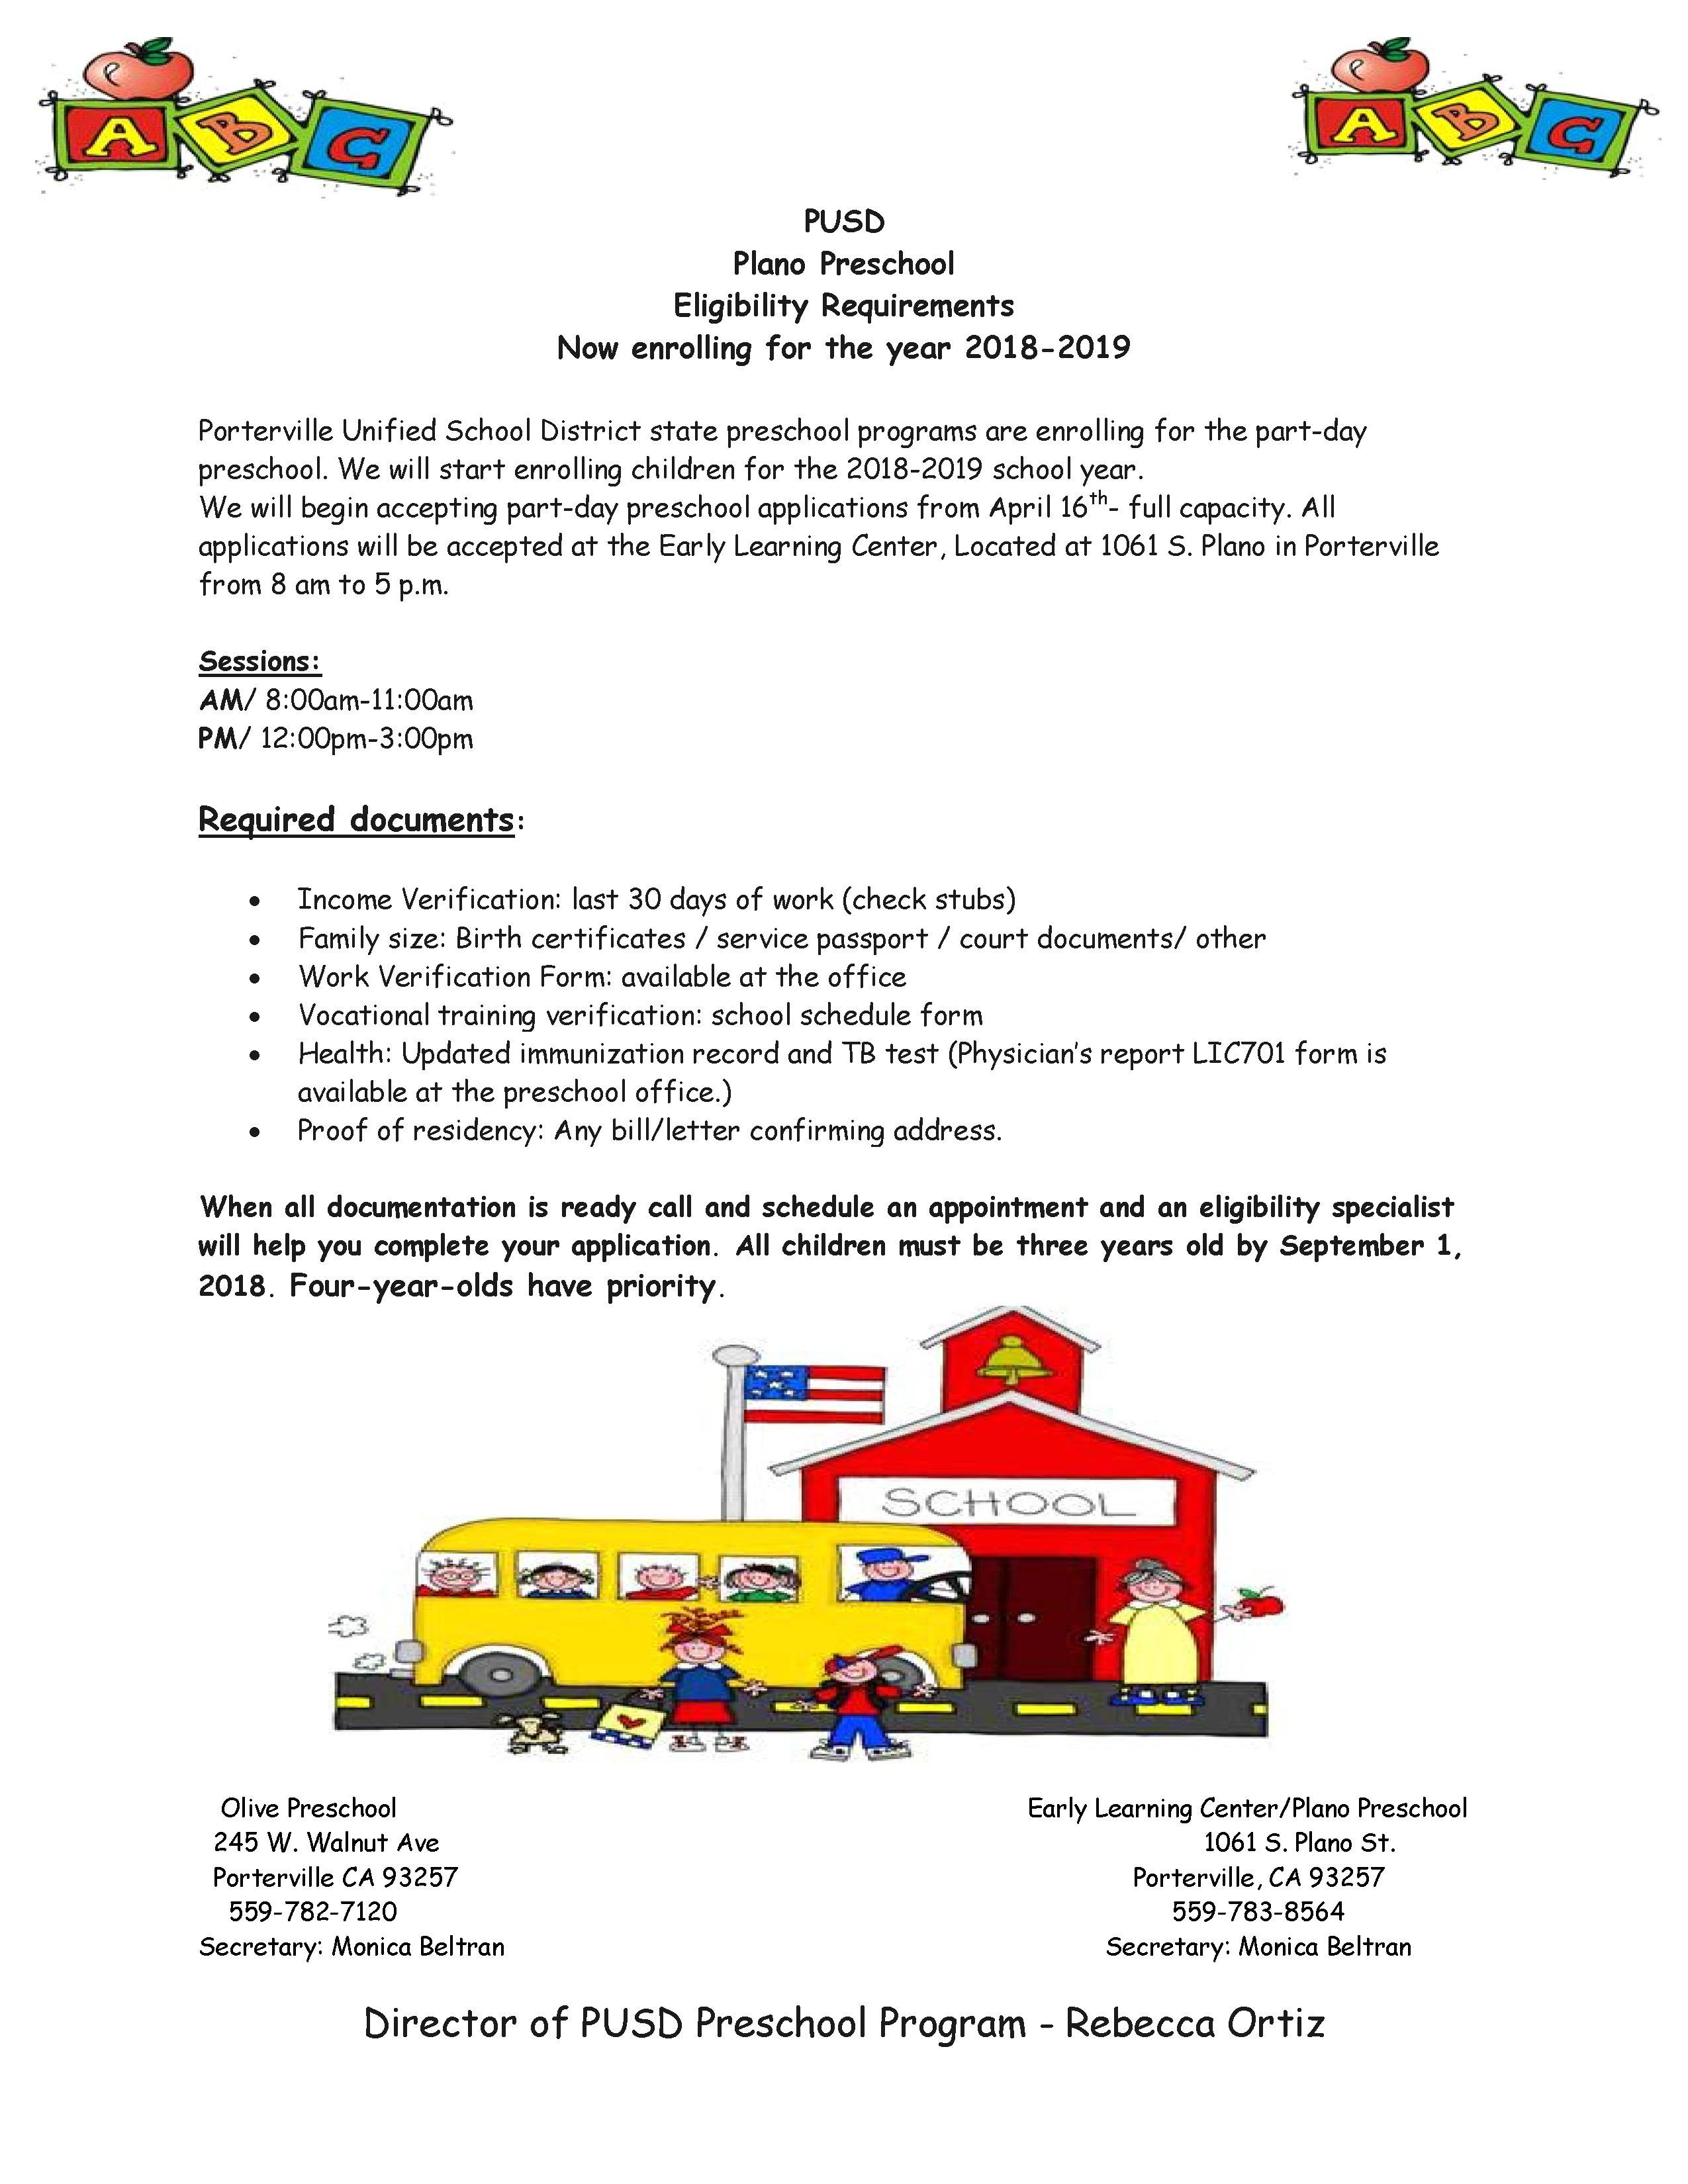 Preschool Programs Information  Preschool Programs  Porterville